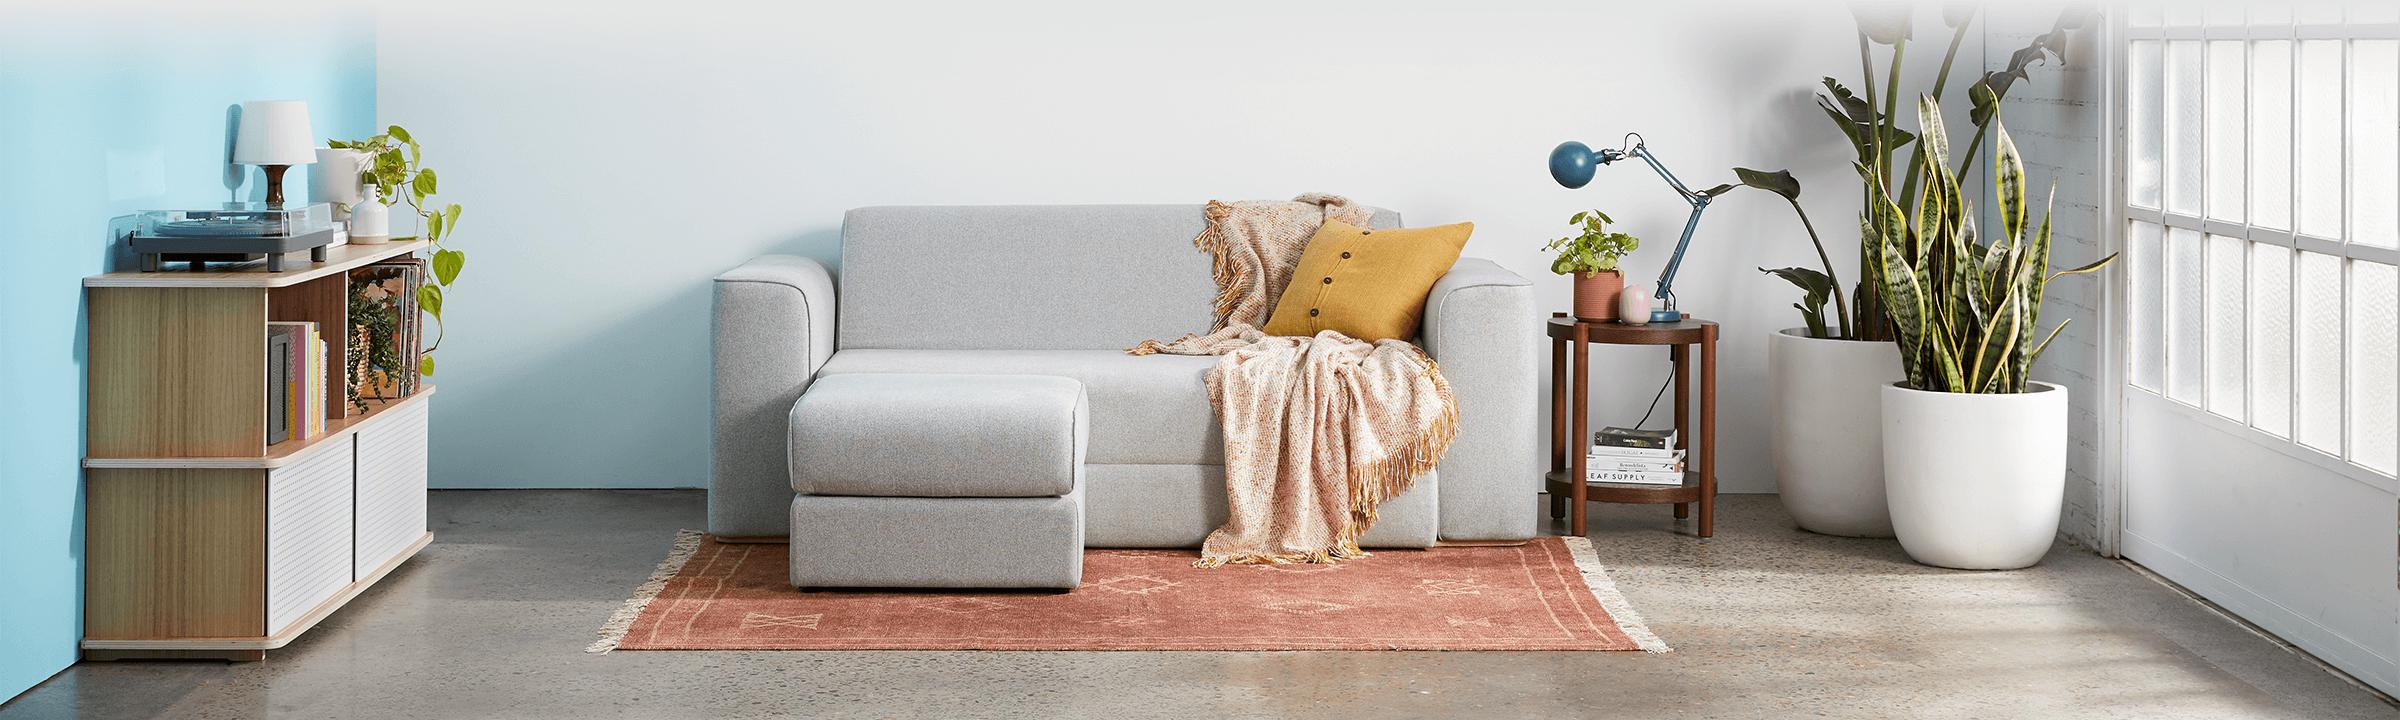 The Koala Sofa Bed Only Queen